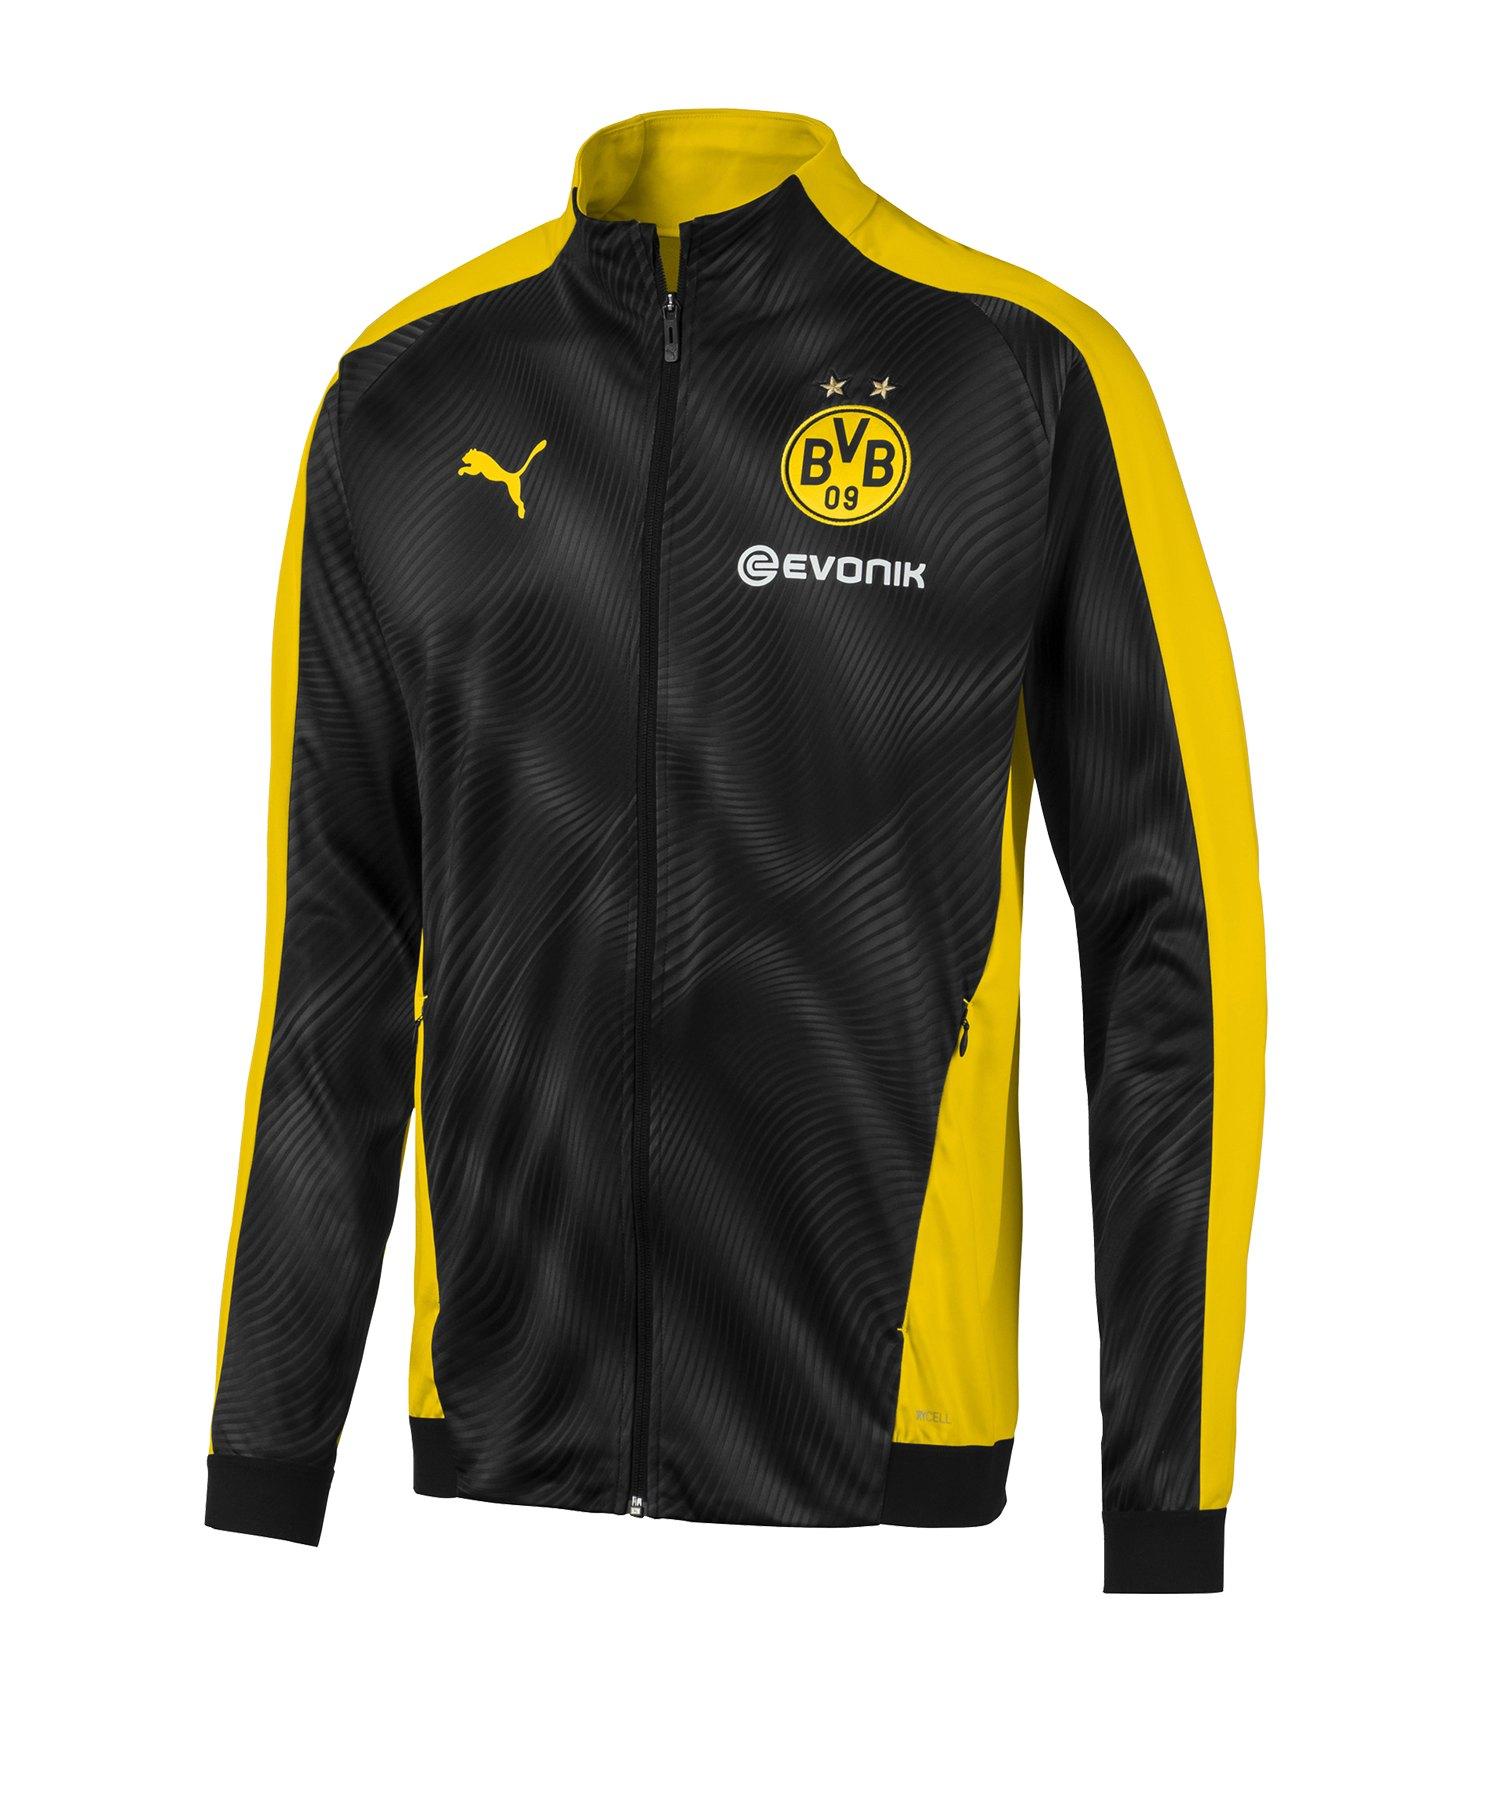 PUMA BVB Dortmund League Coachjacke Gelb F01 - Gelb